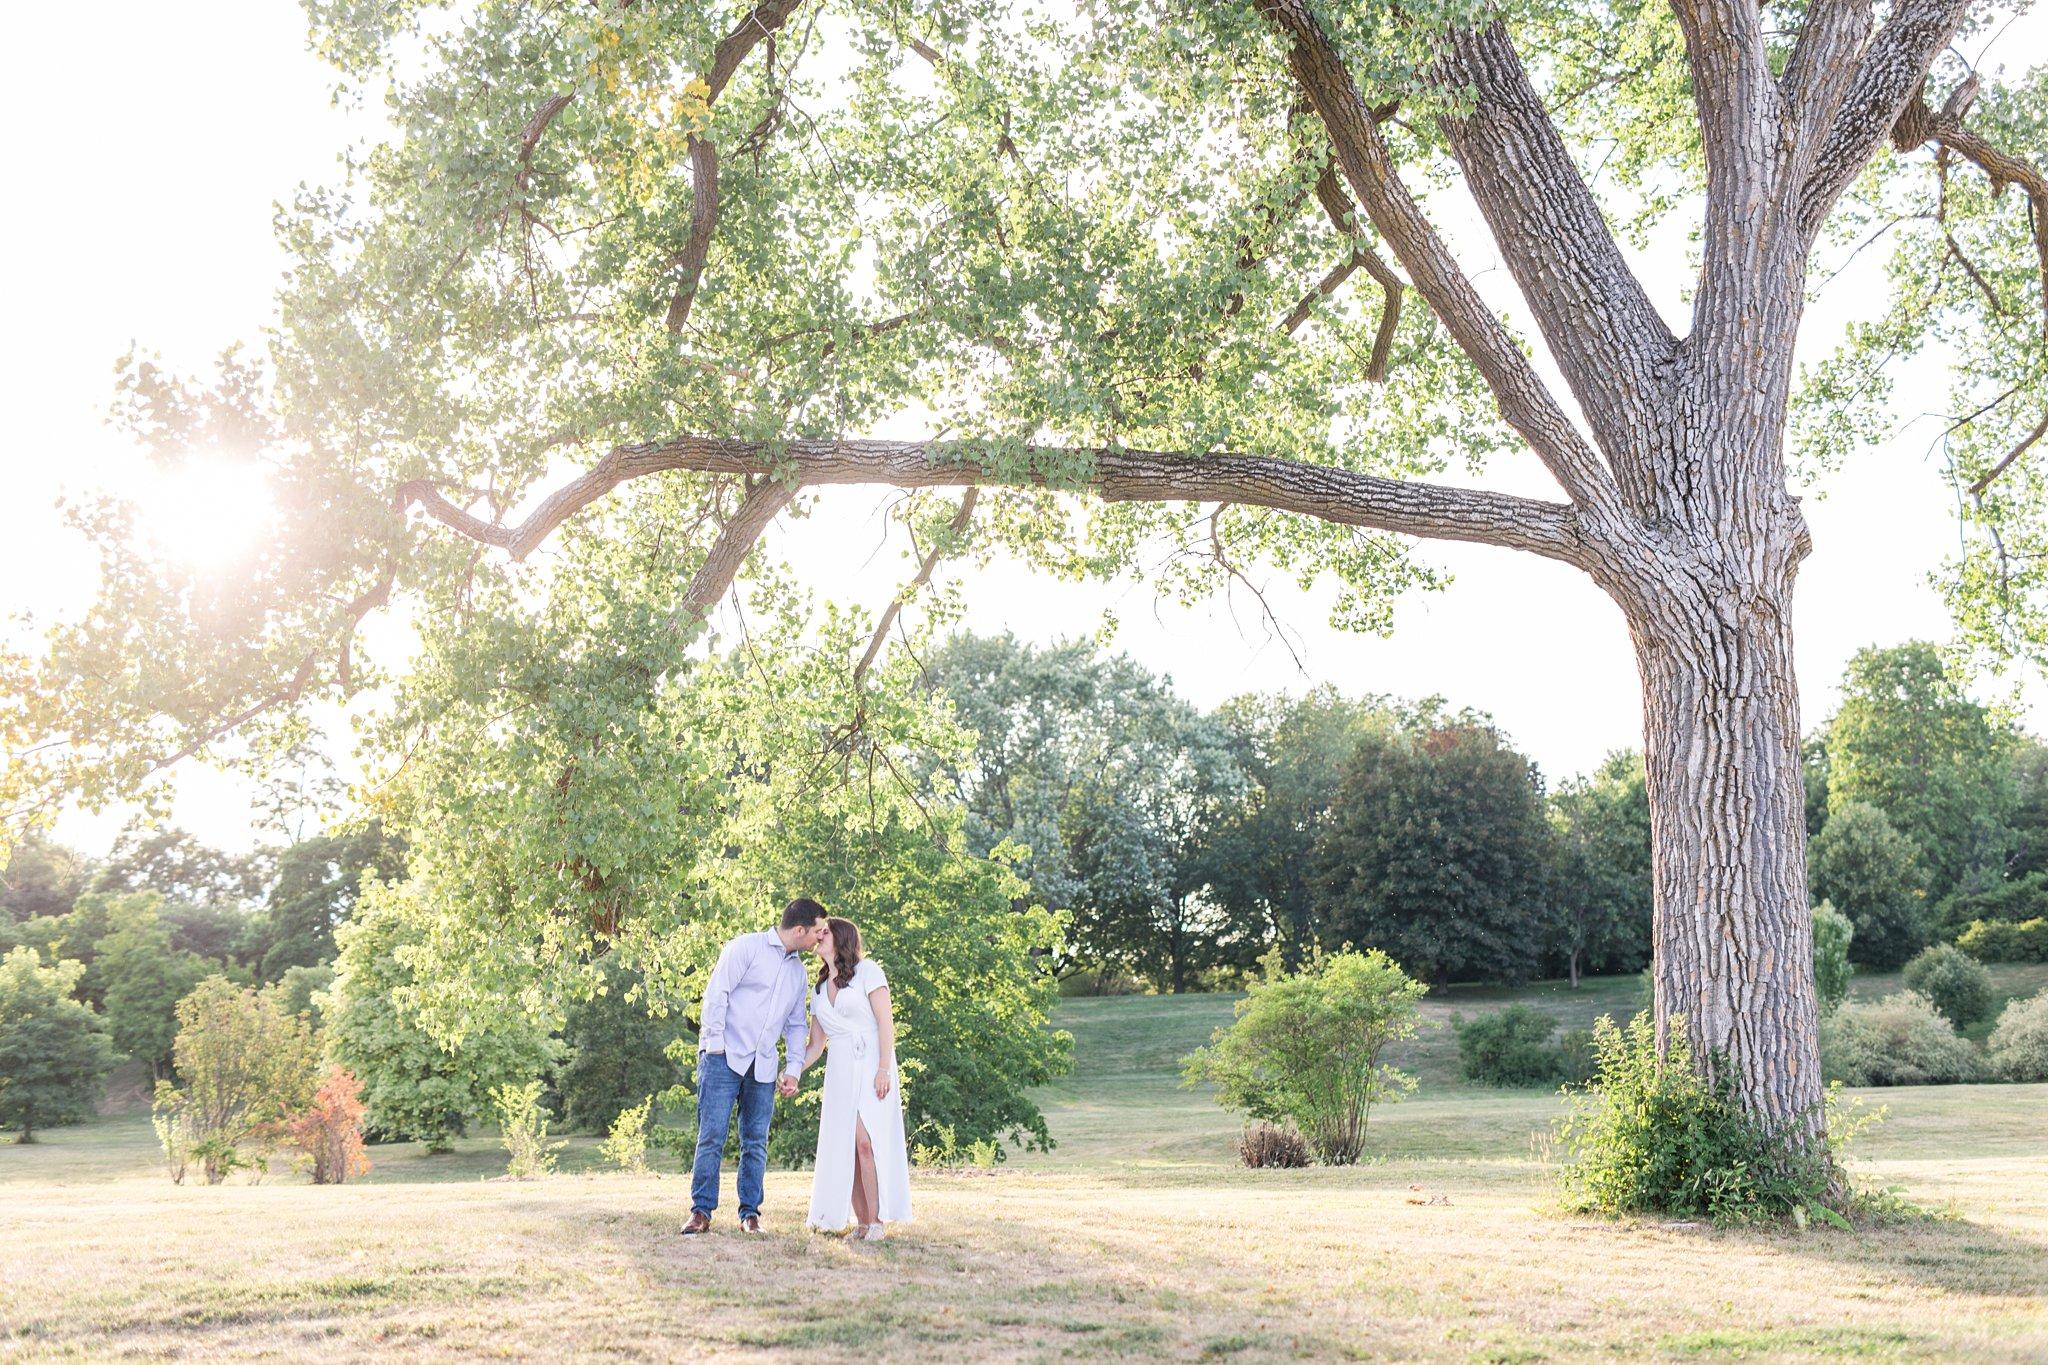 Large tree, Arboretum, Fletcher's Wildlife Garden Engagement photos